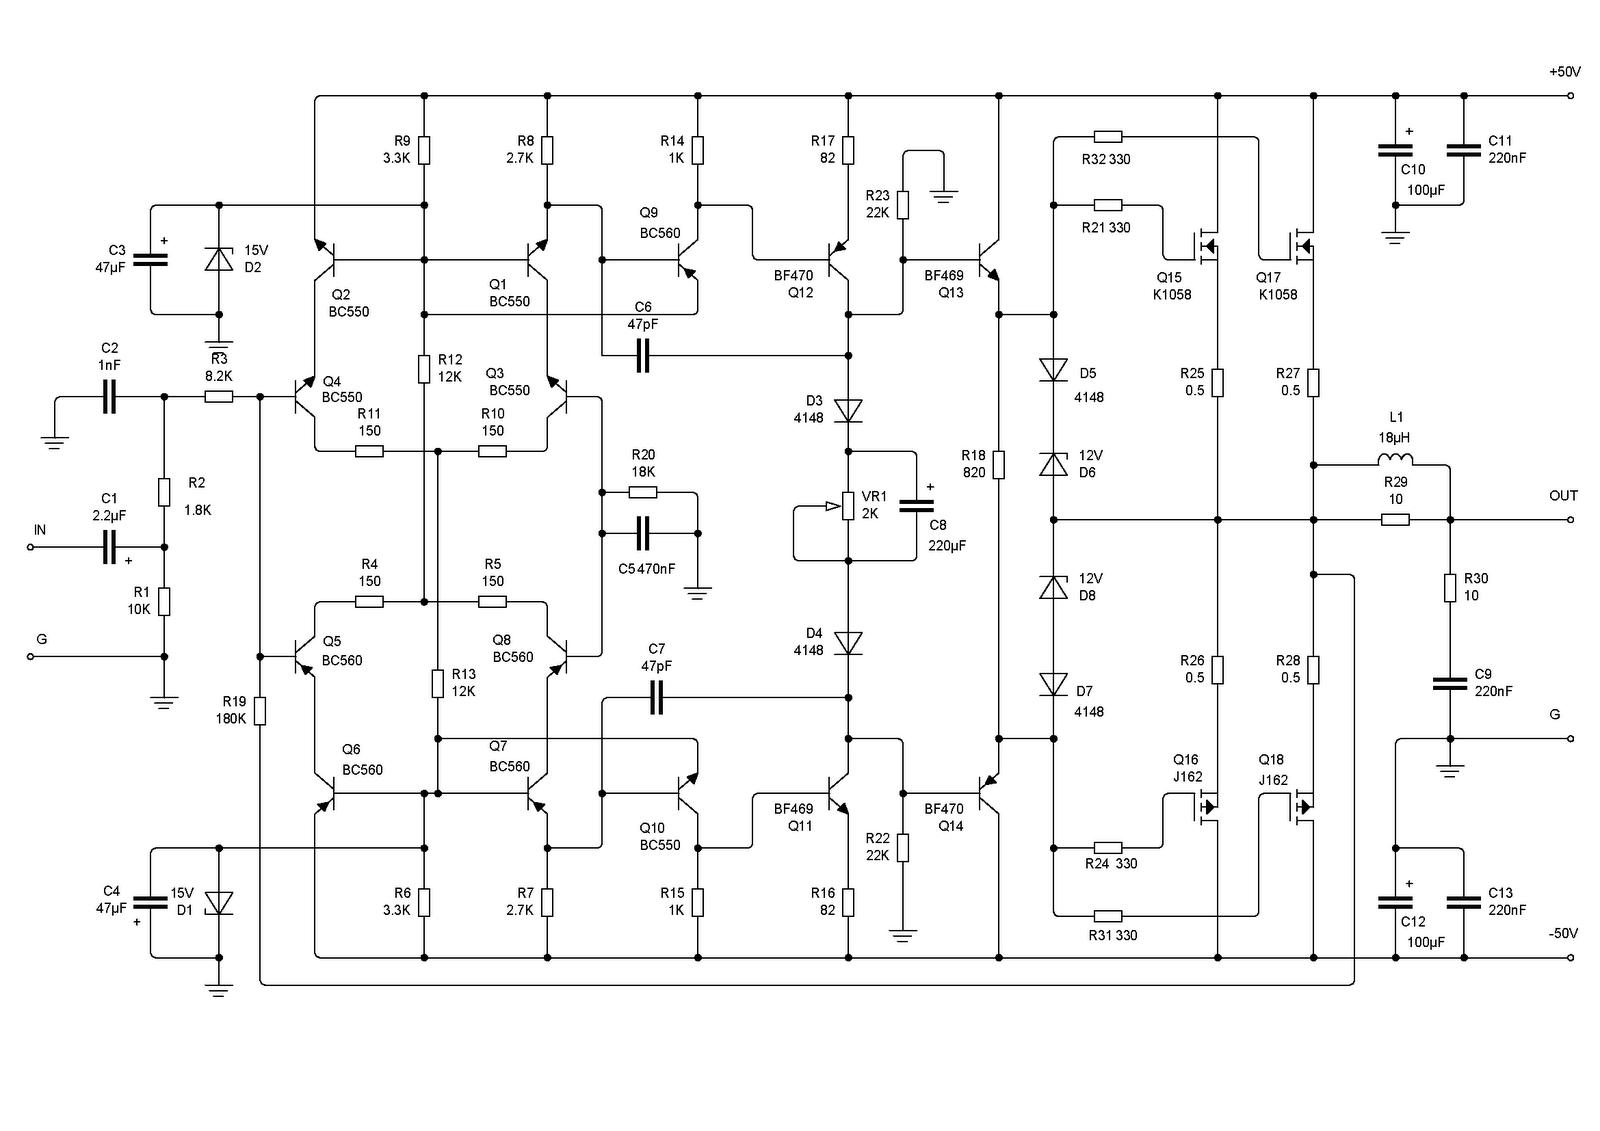 Mosfet Amplifier Schematic Trusted Wiring Diagram 240w 200w K1058 J162 Class A Audio Circuit The Diy Schematics